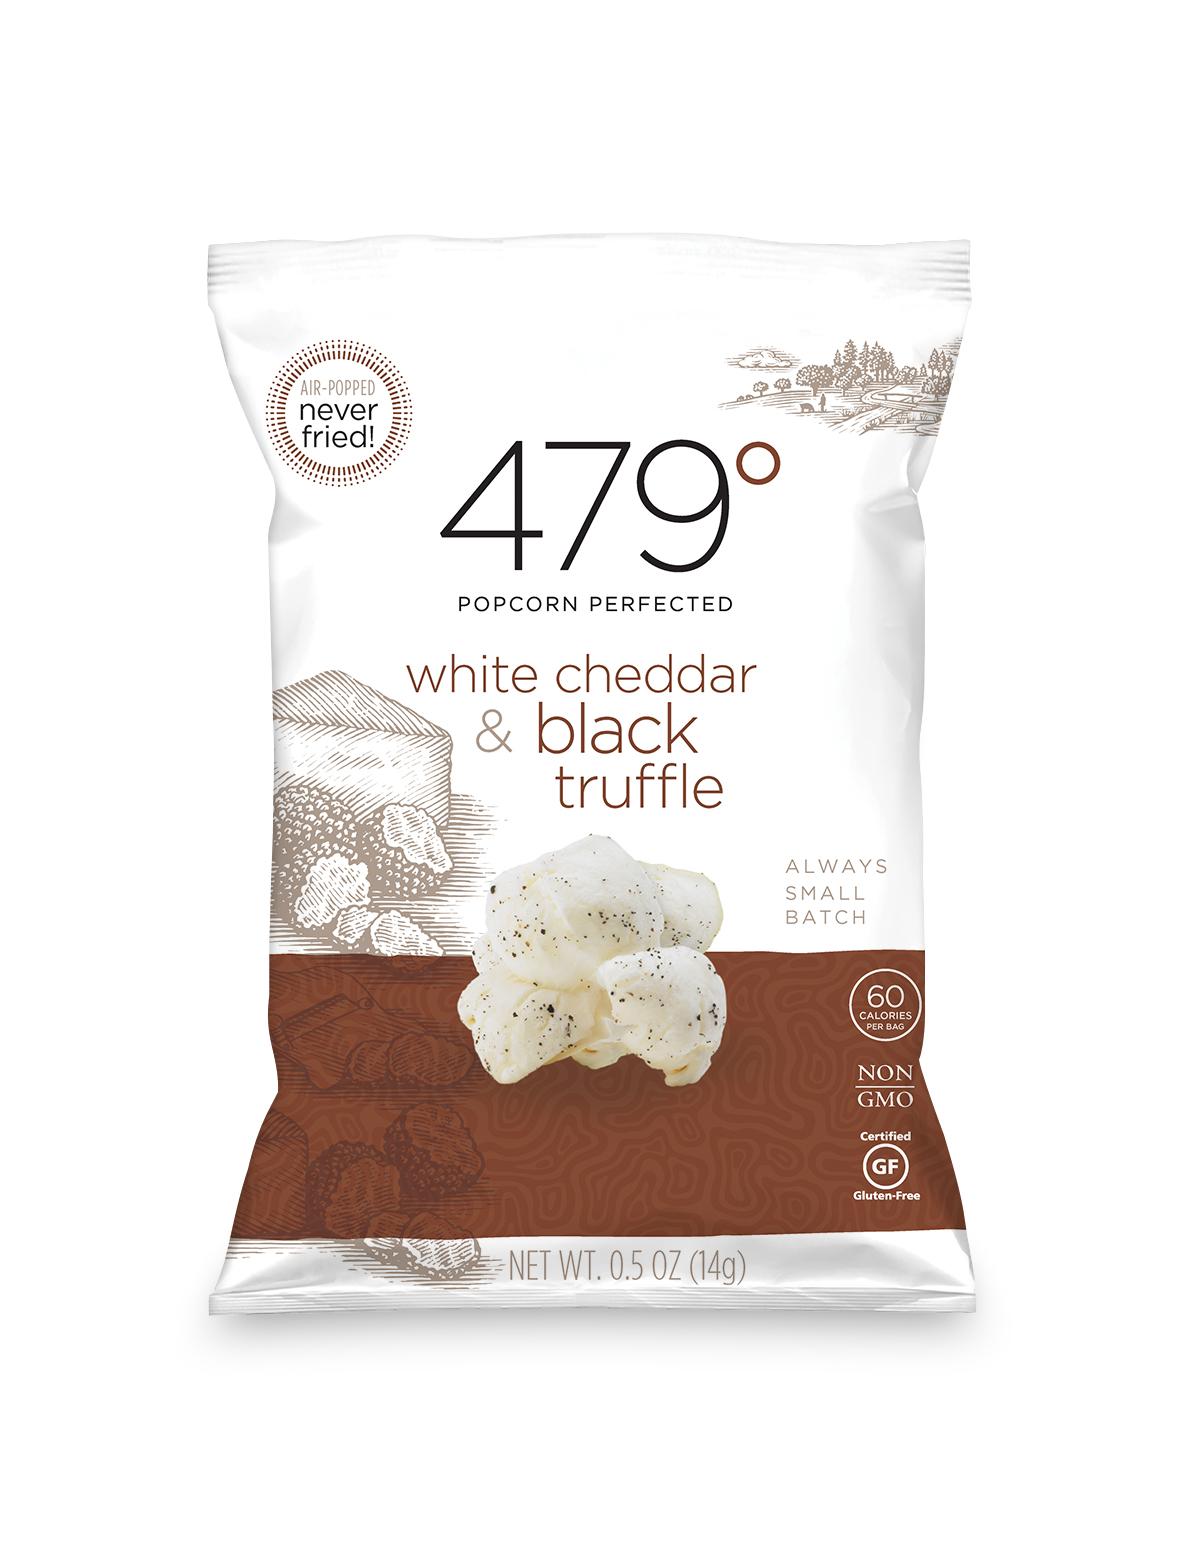 .5oz white cheddar & black truffle